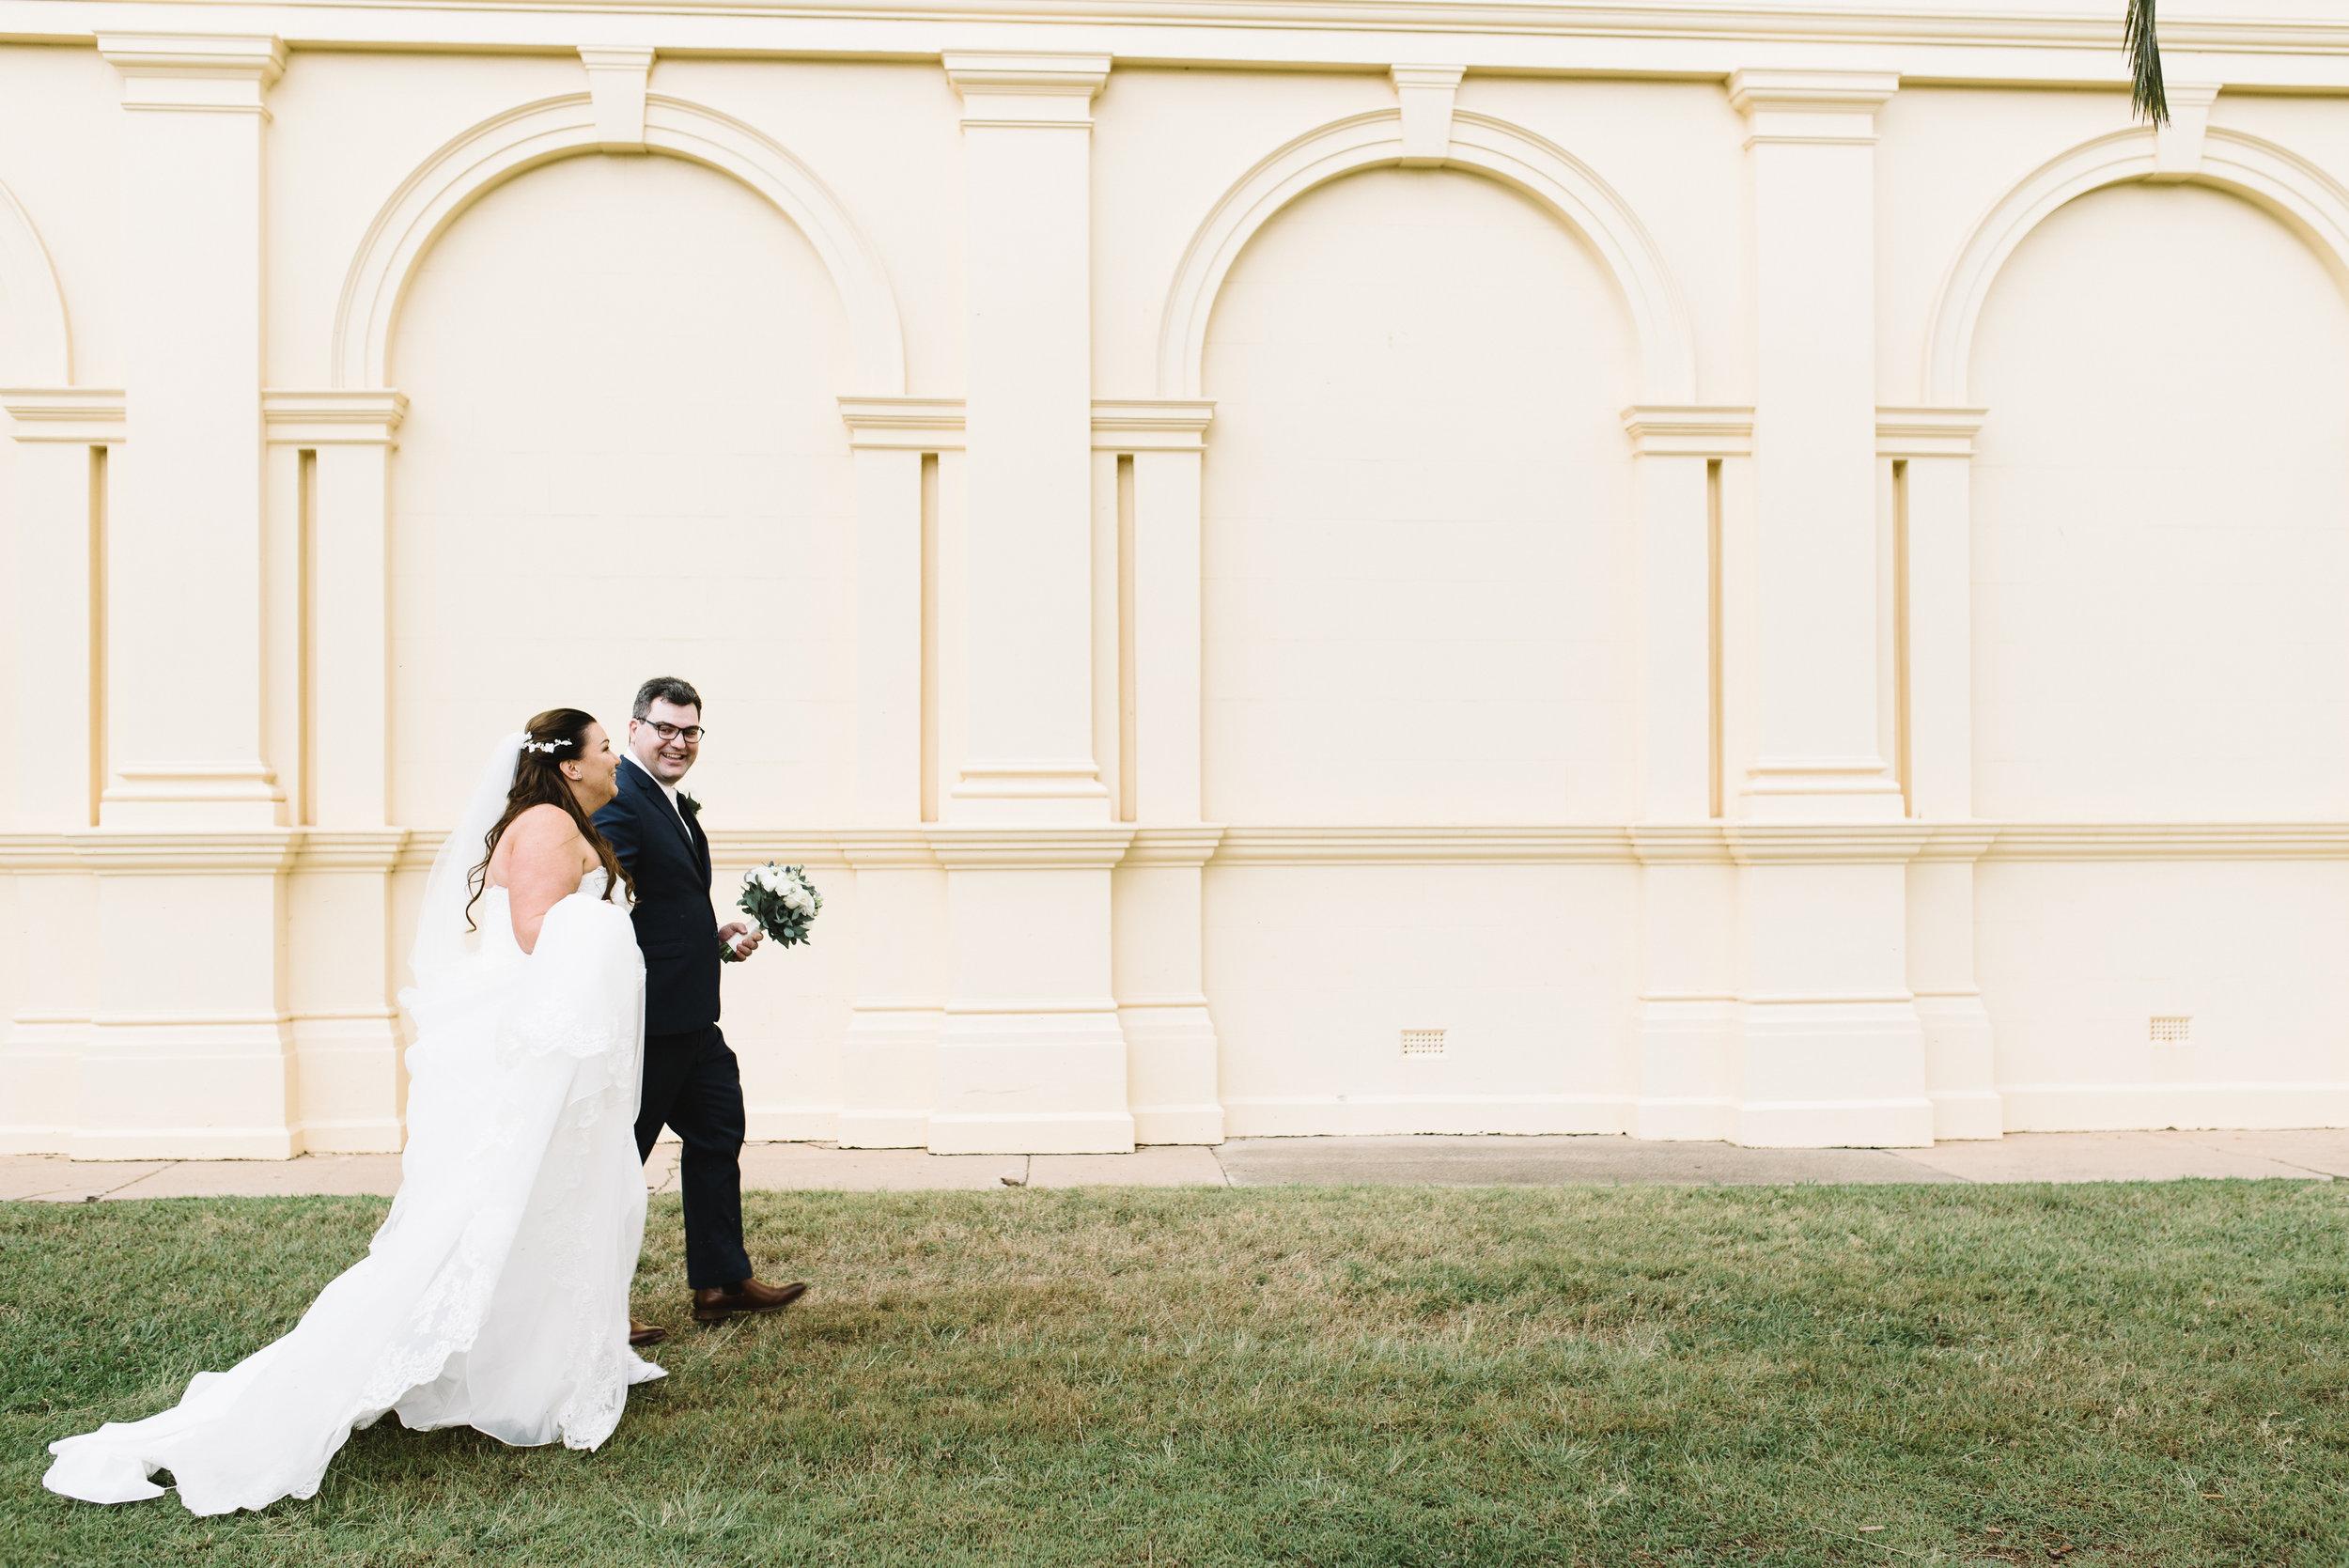 brisbane-wedding-photographer-59.jpg